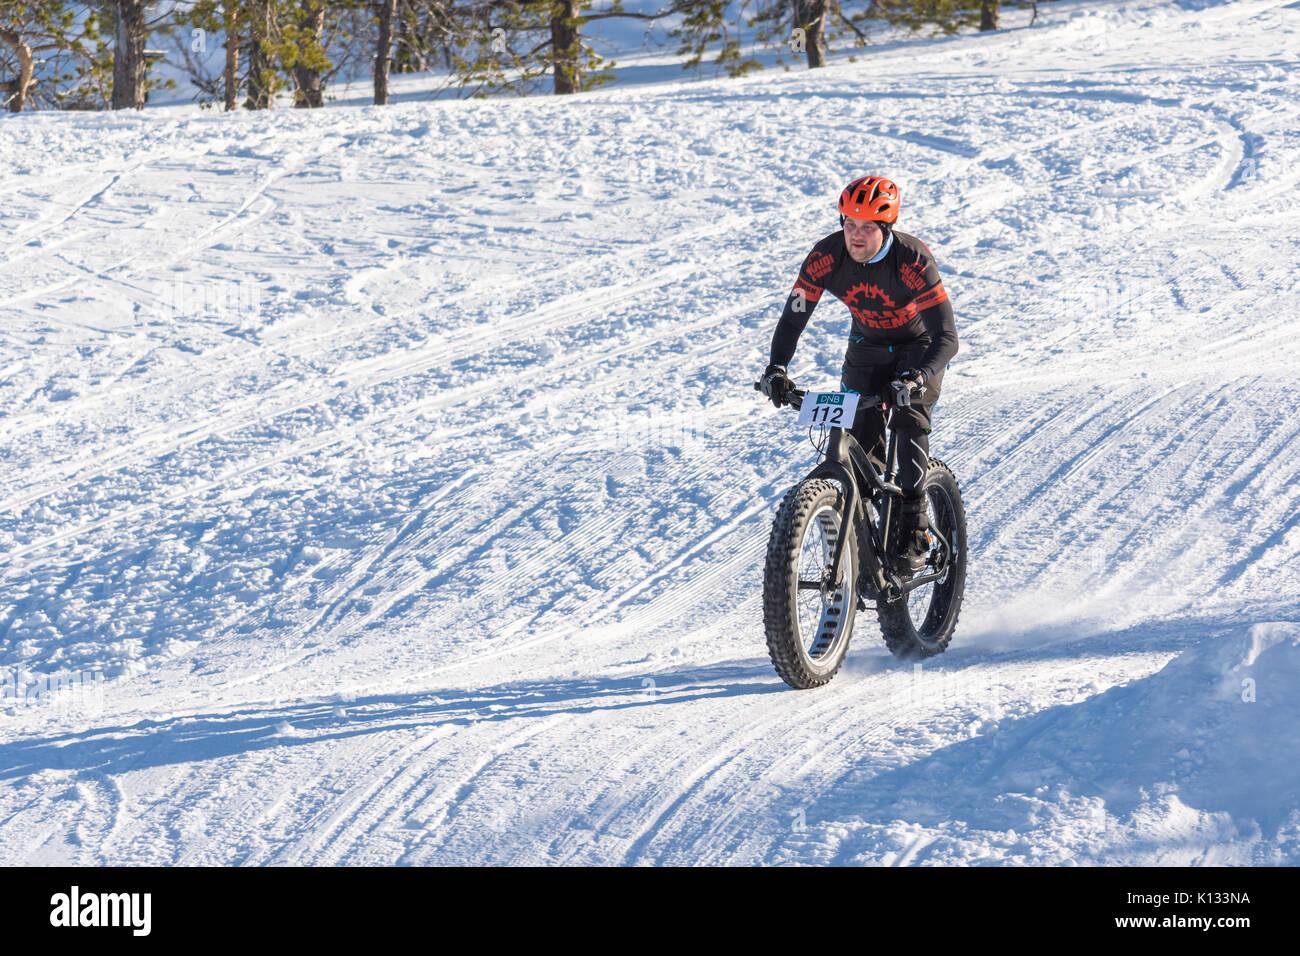 Fatbike, race, racing, snow, winter, arctic, Finnmark, Alta, Norway, Norge, konkurranse, sykling, vinter - Stock Image